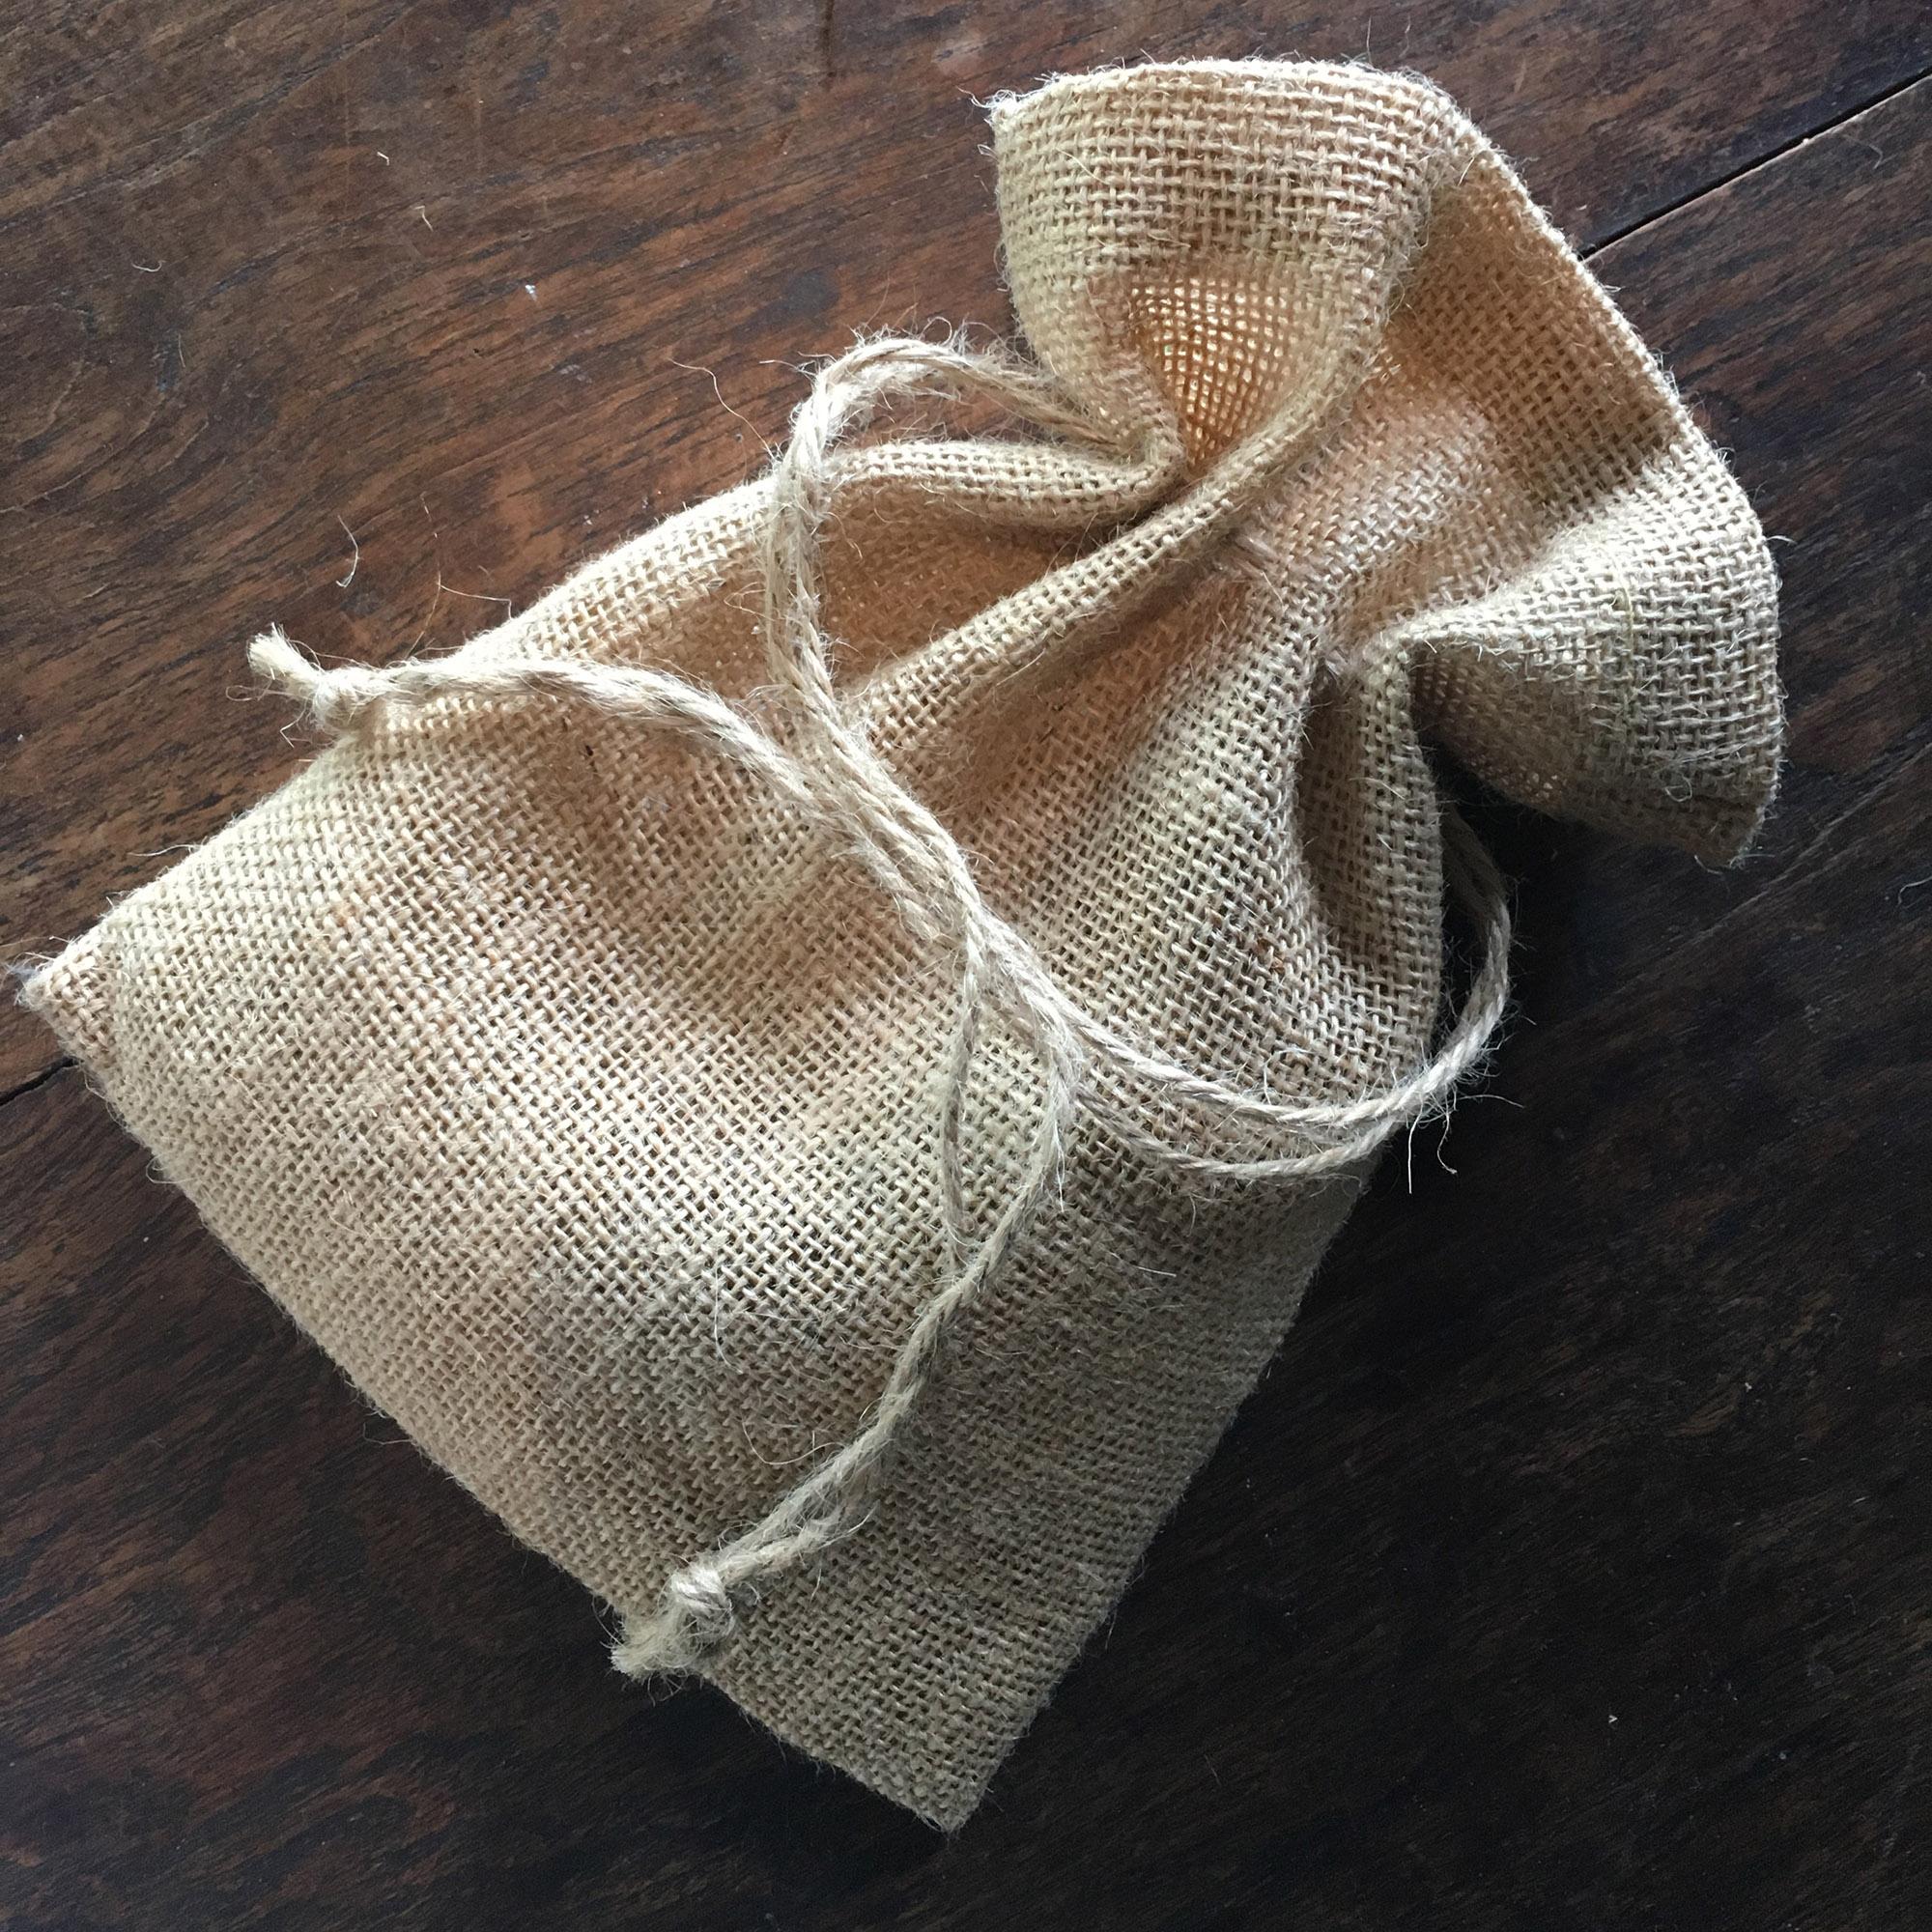 drawstring eco bag from Thailand